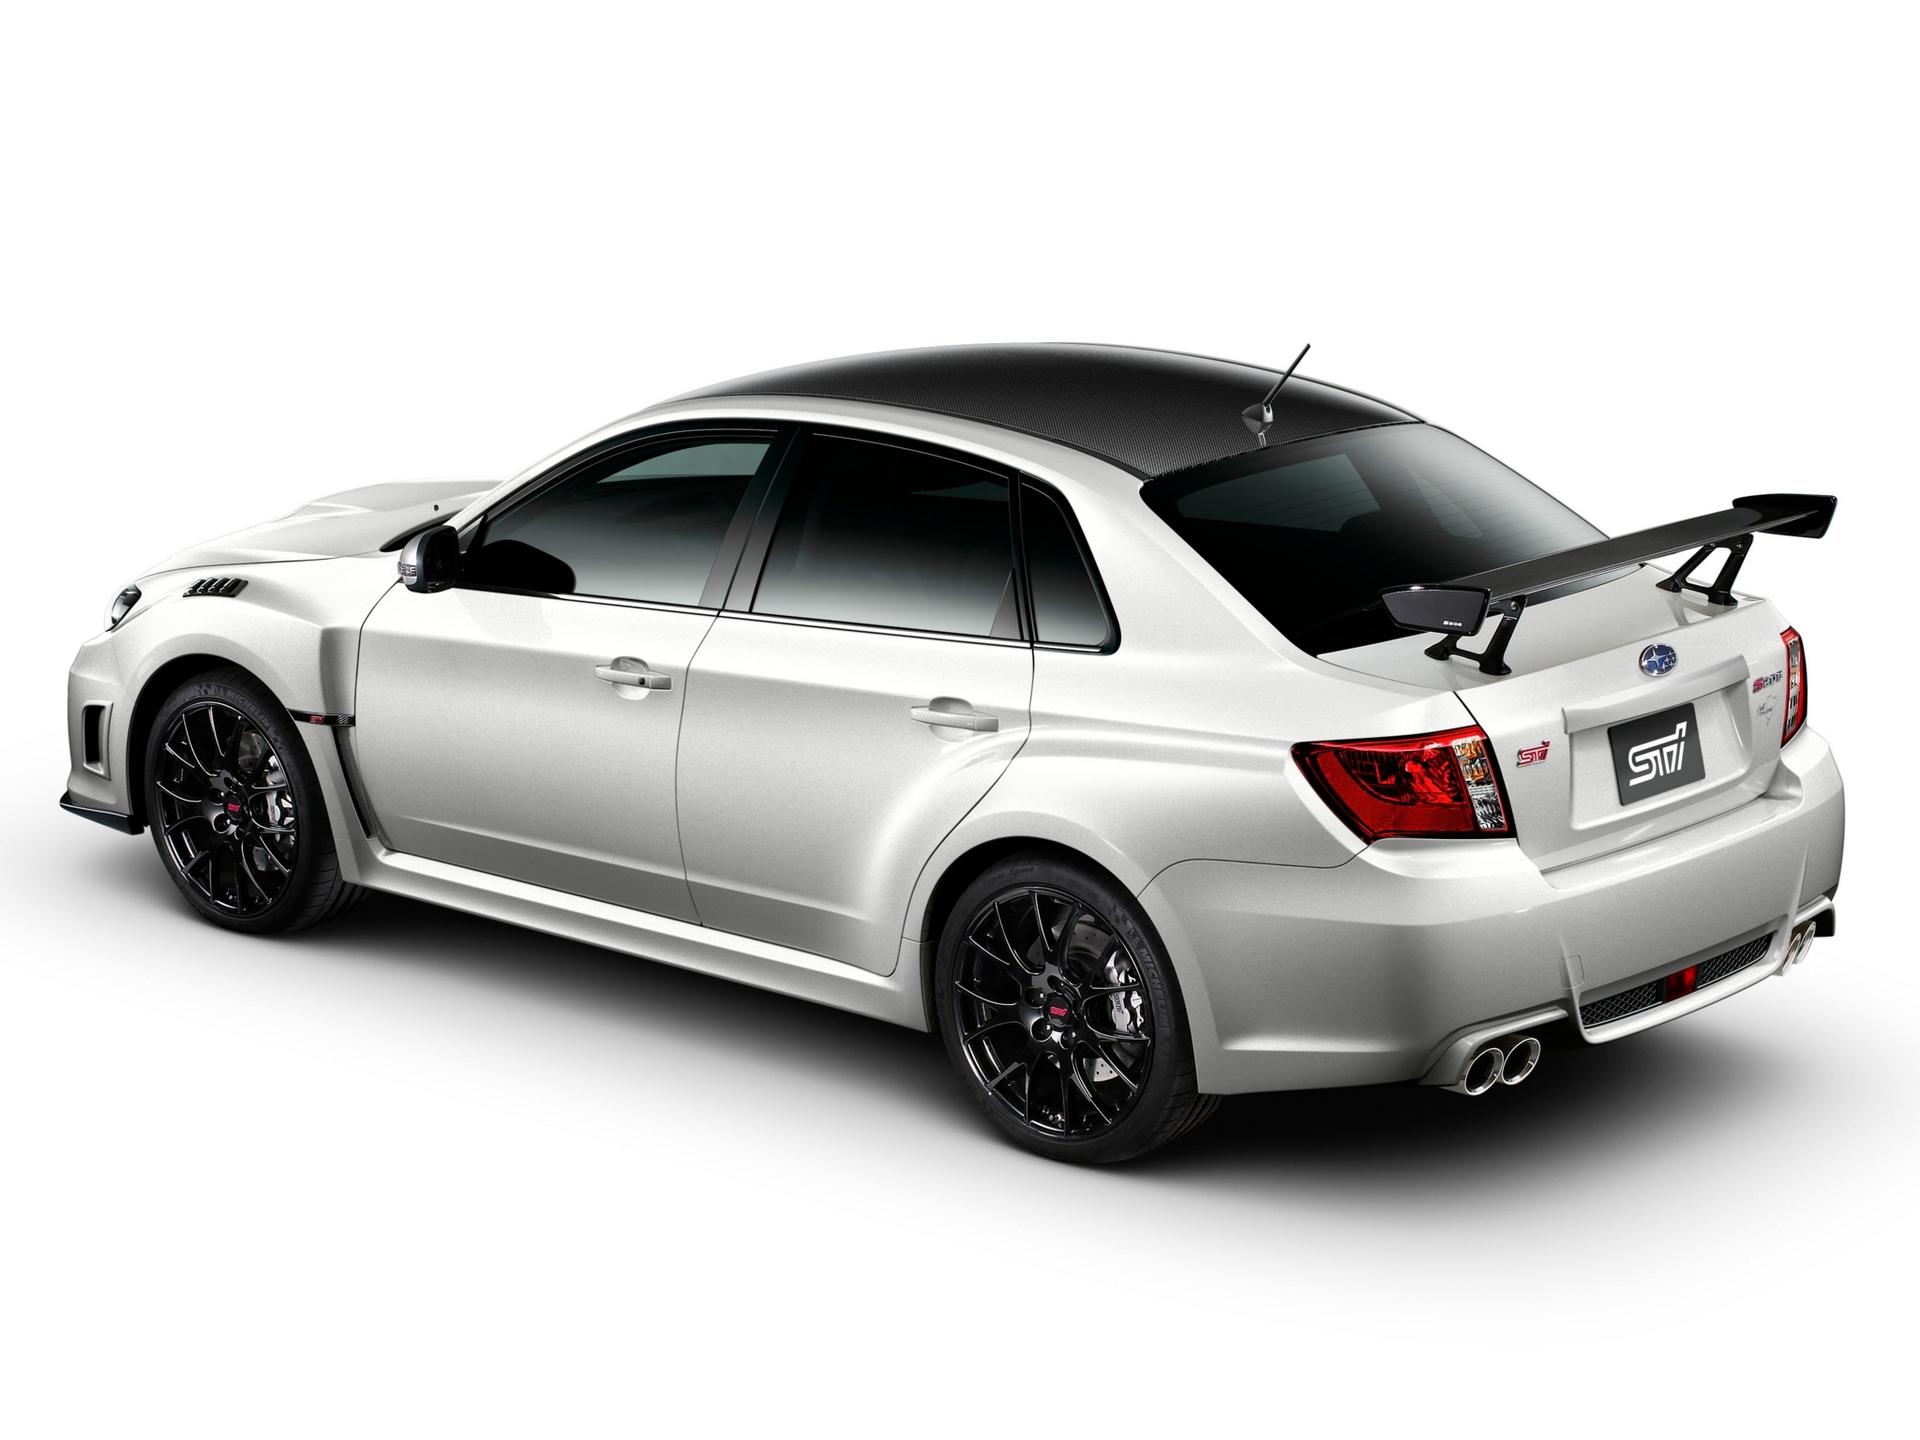 Subaru_Impreza_STI_S206_NBR_Challenge_Package_0001